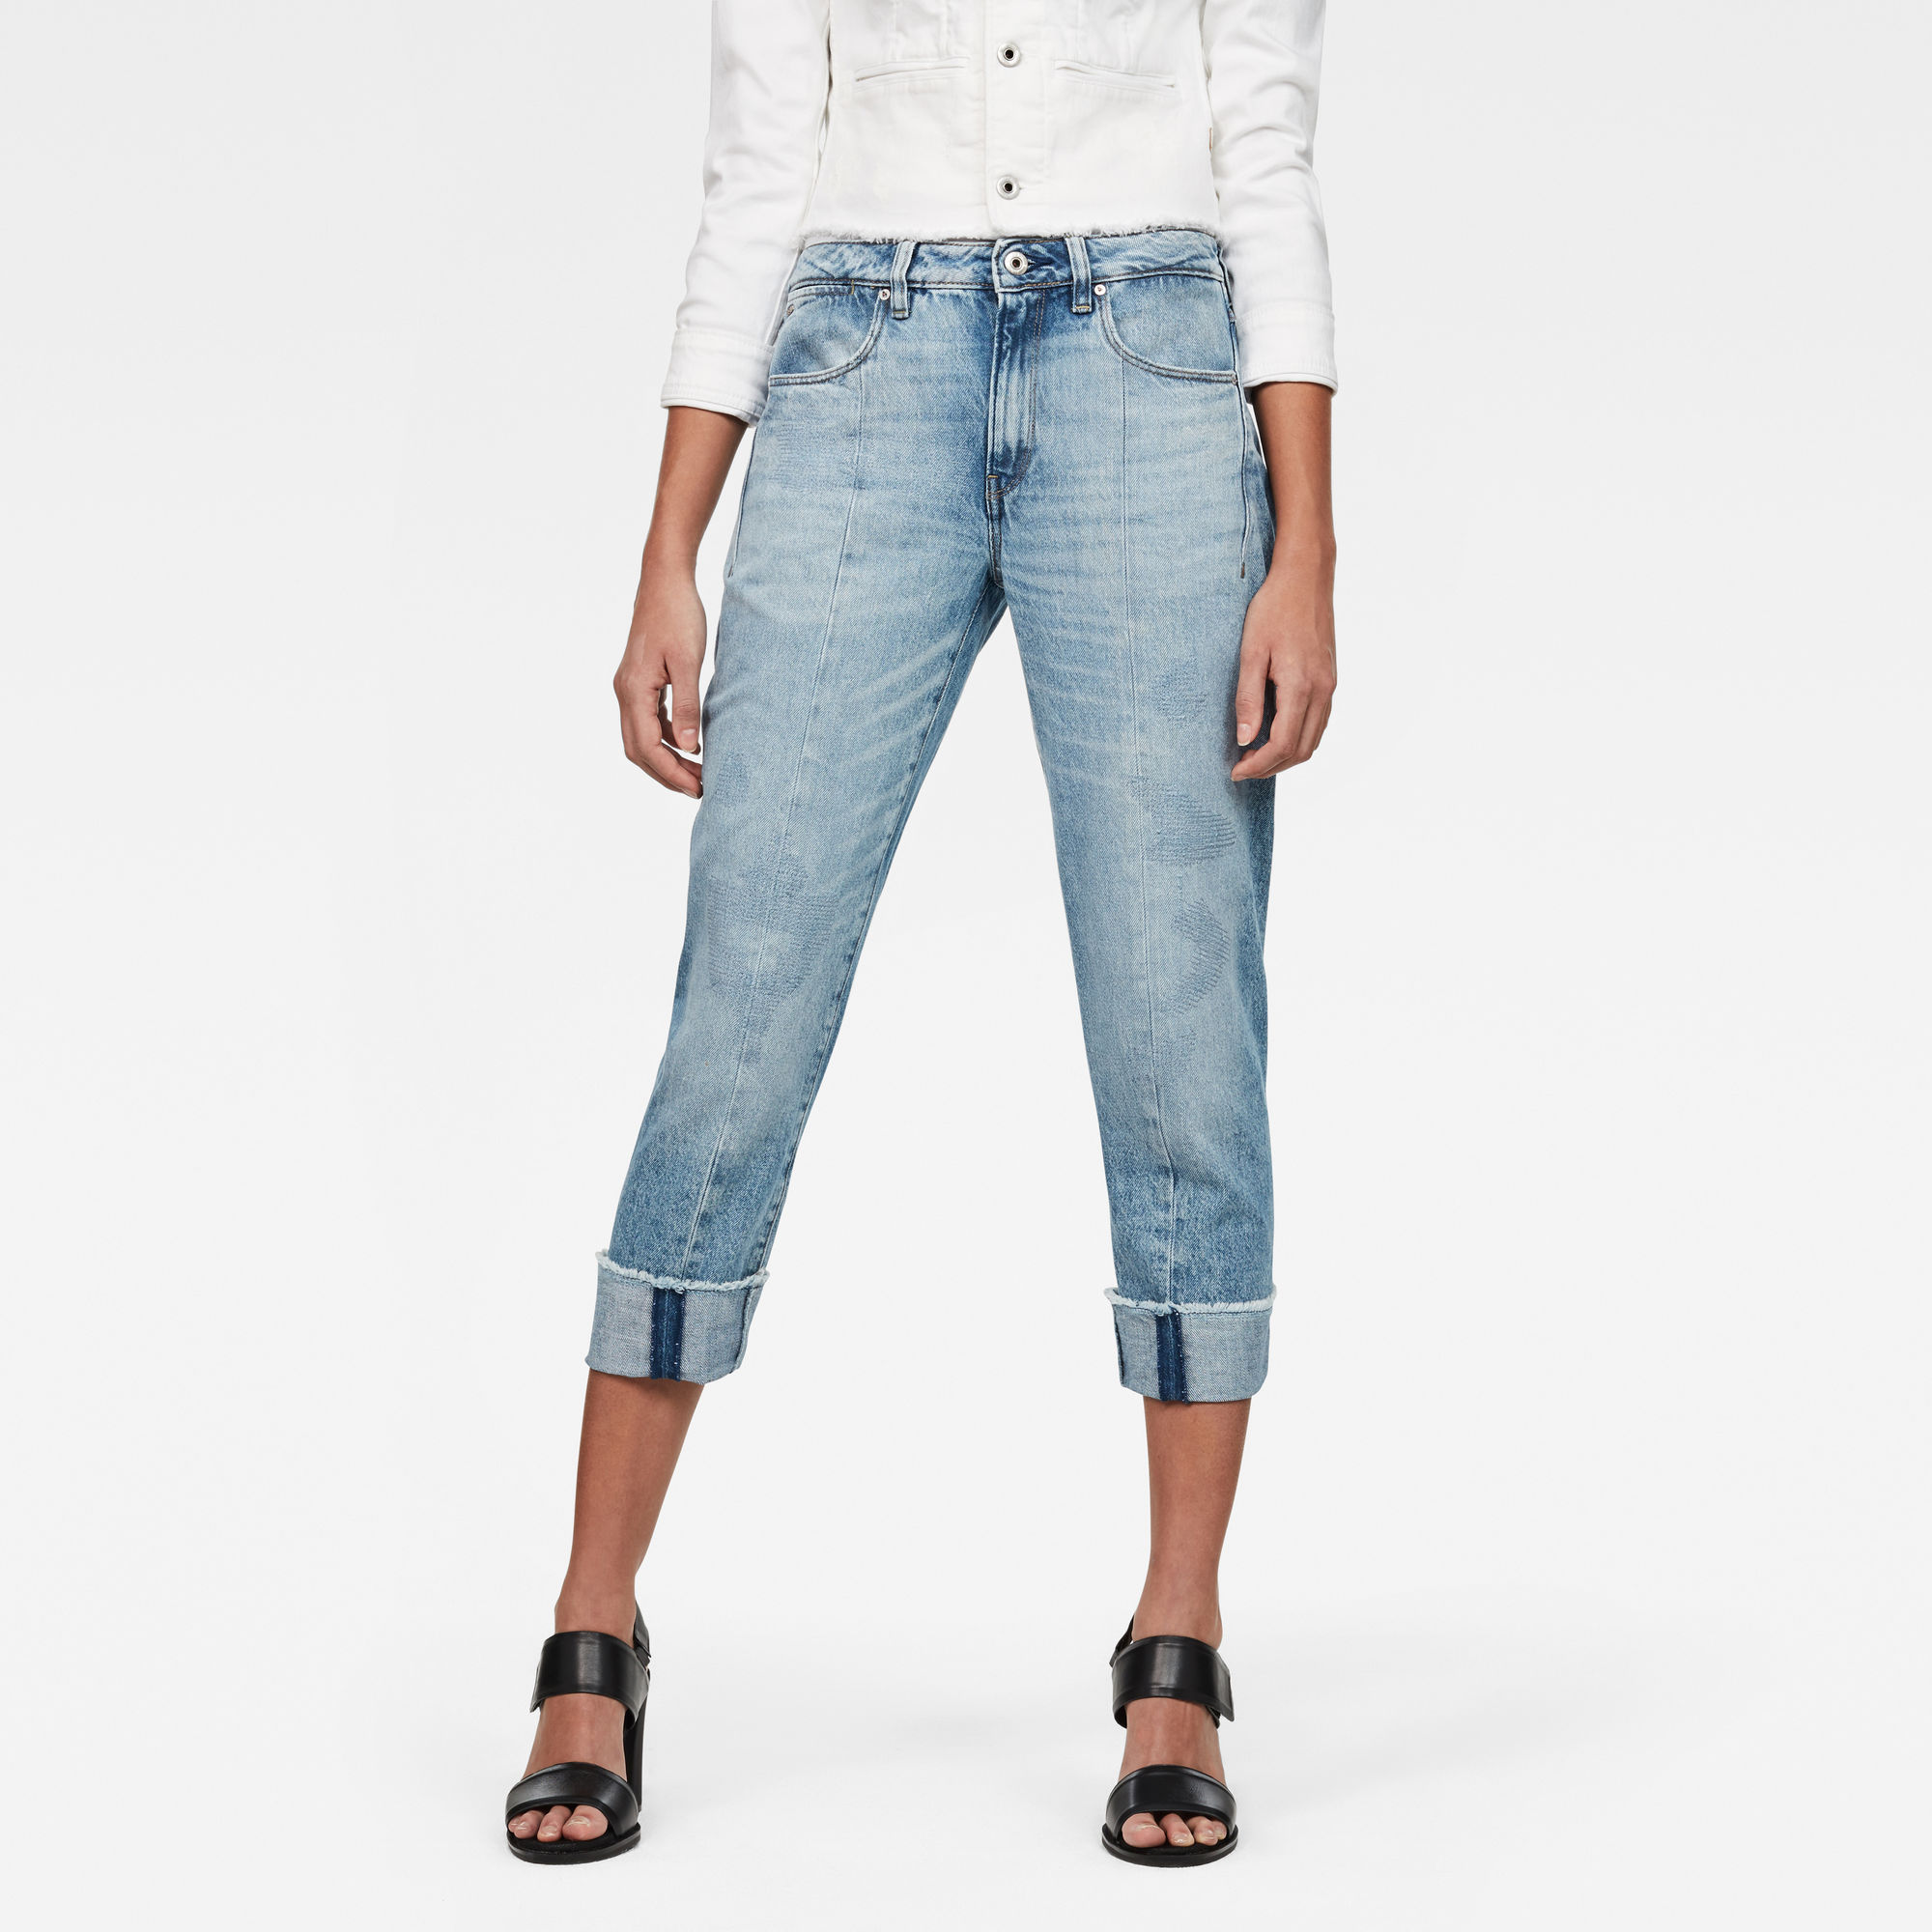 Lanc 3D High waist Straight Ripped Jeans